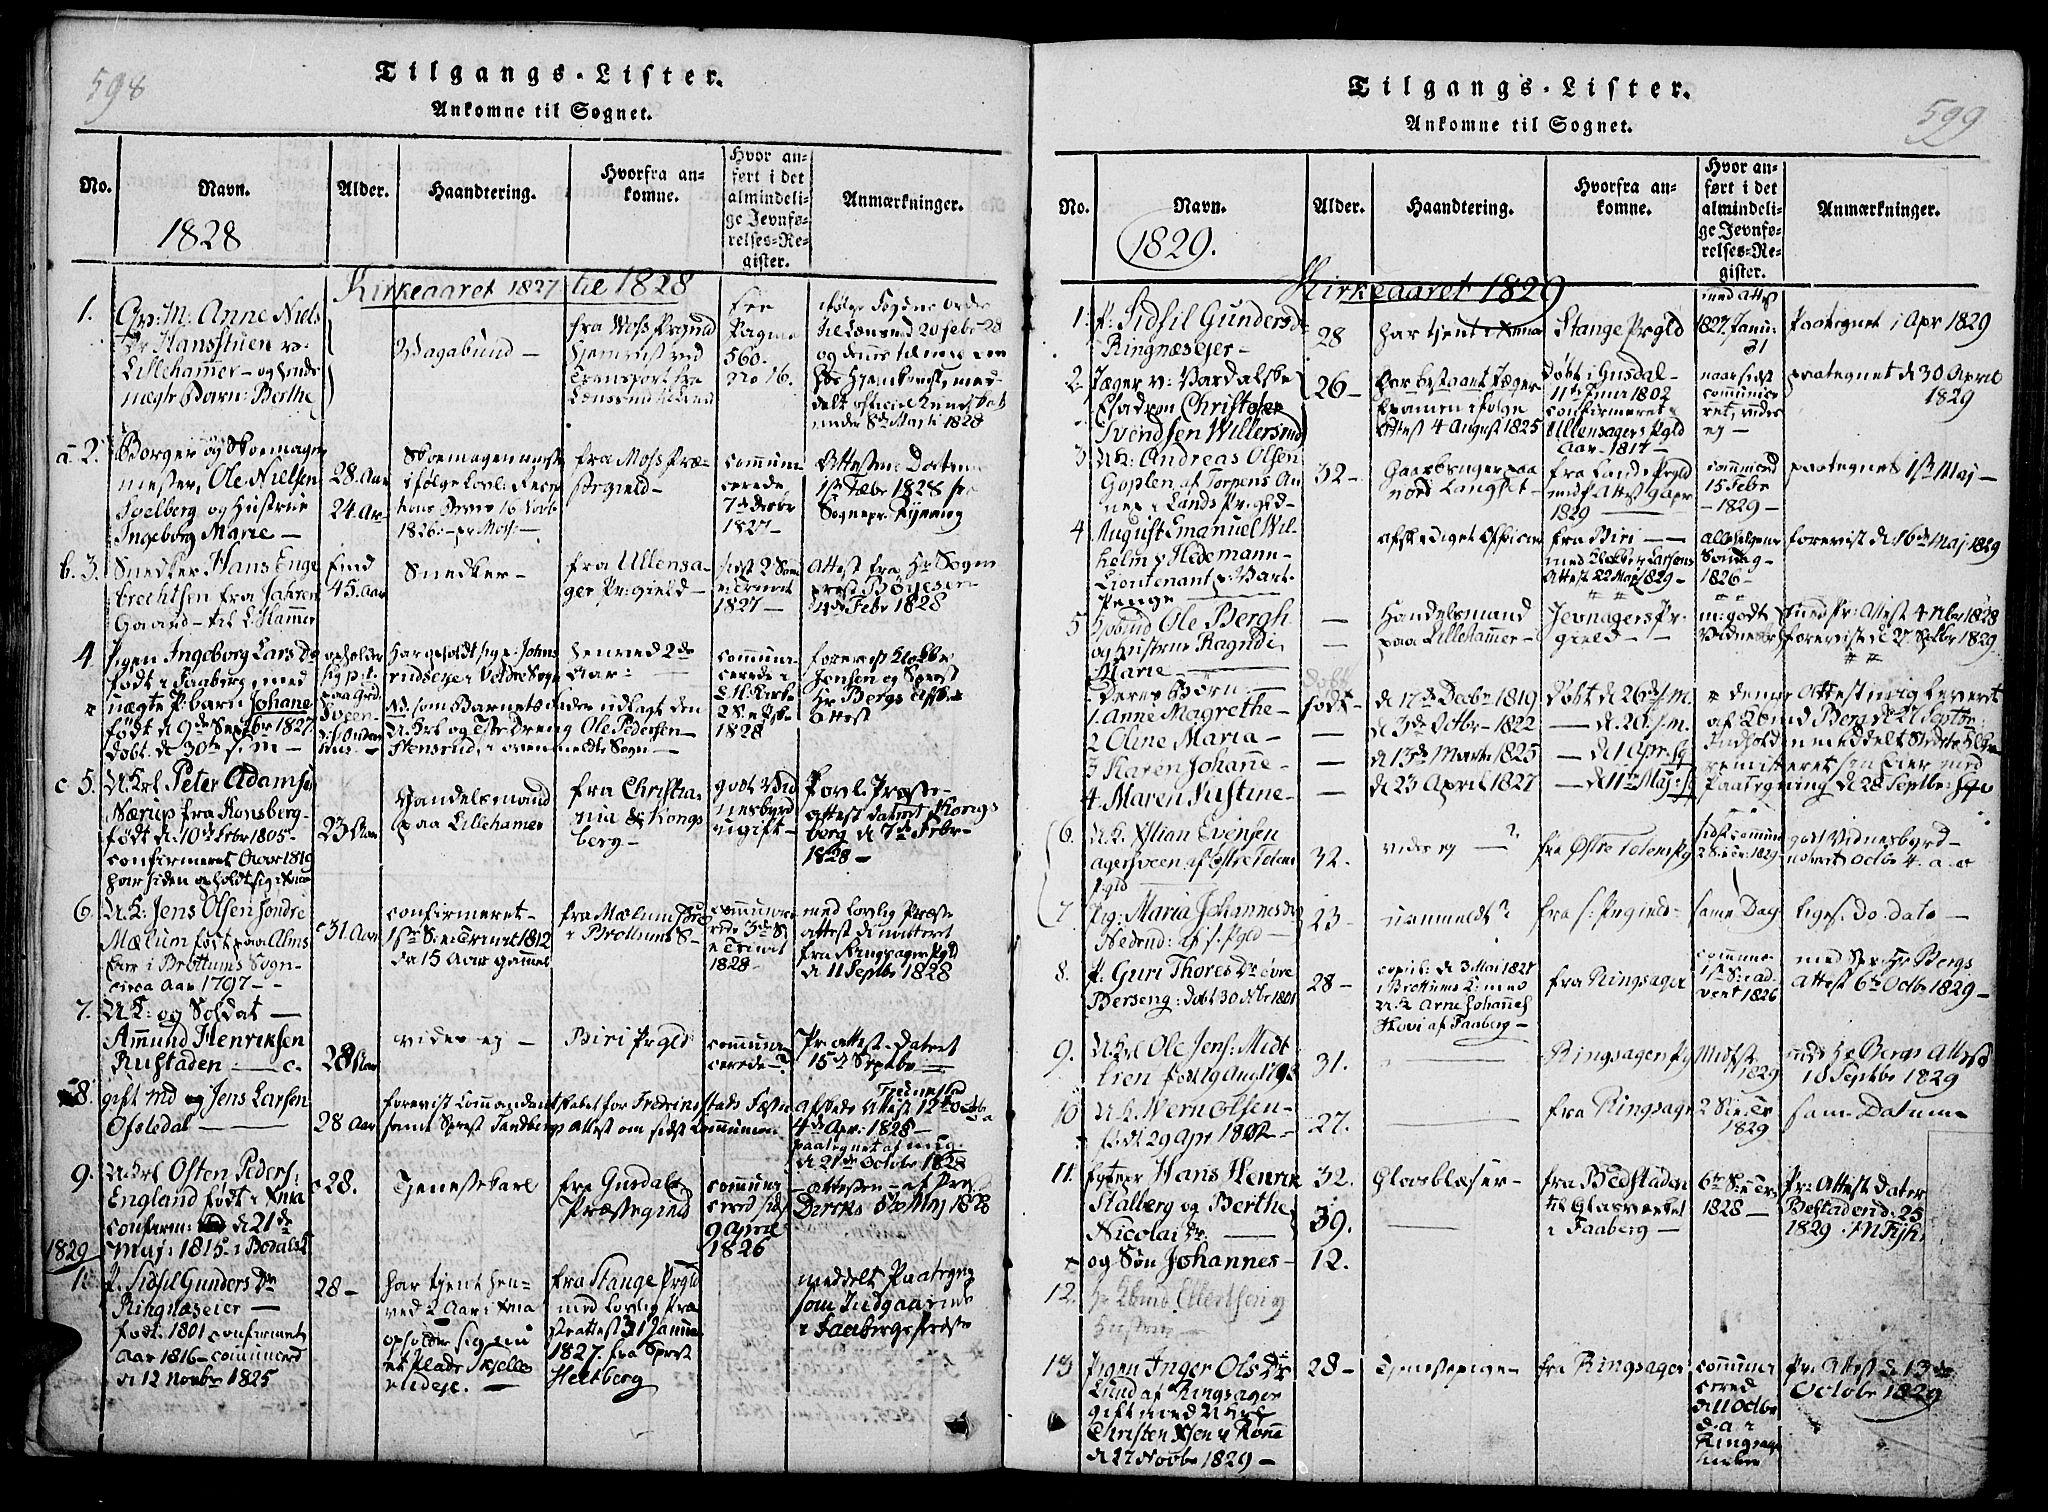 SAH, Fåberg prestekontor, Ministerialbok nr. 3, 1818-1833, s. 598-599